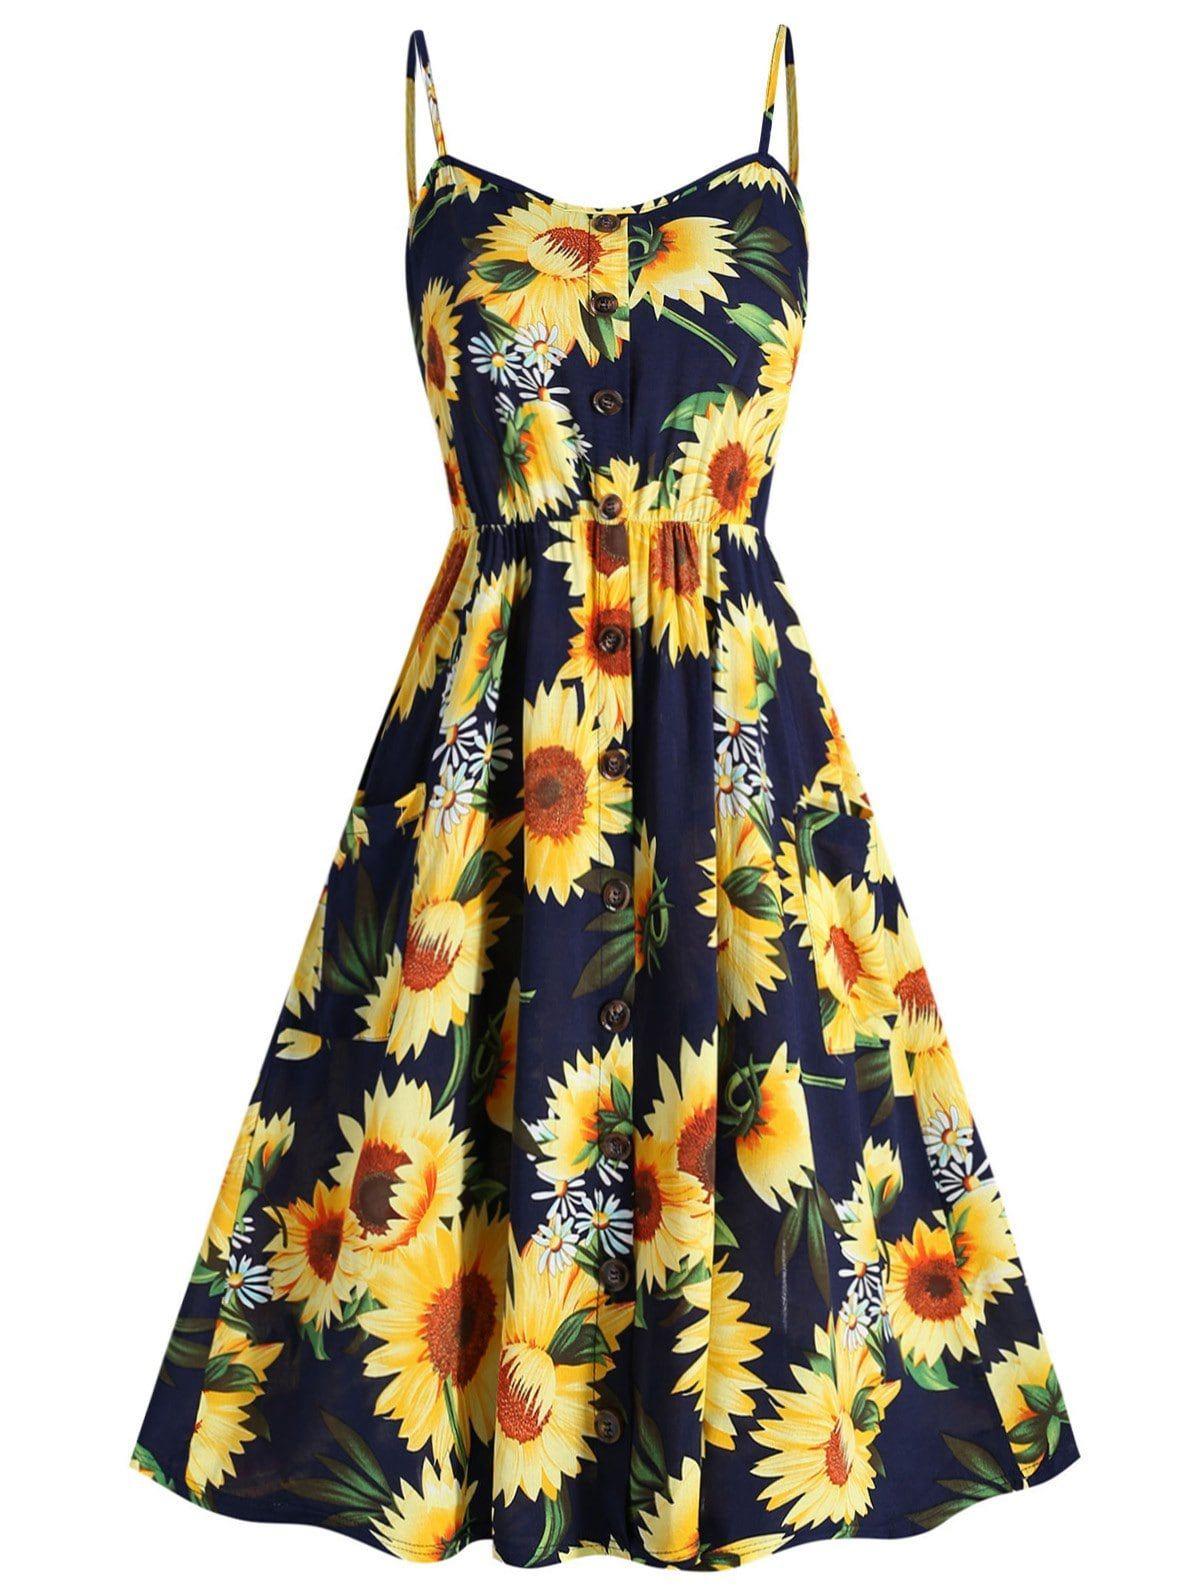 Plus Size Sunflower Print Cami Dress A Line Dress Dresses Plus Size Dresses [ 1596 x 1200 Pixel ]